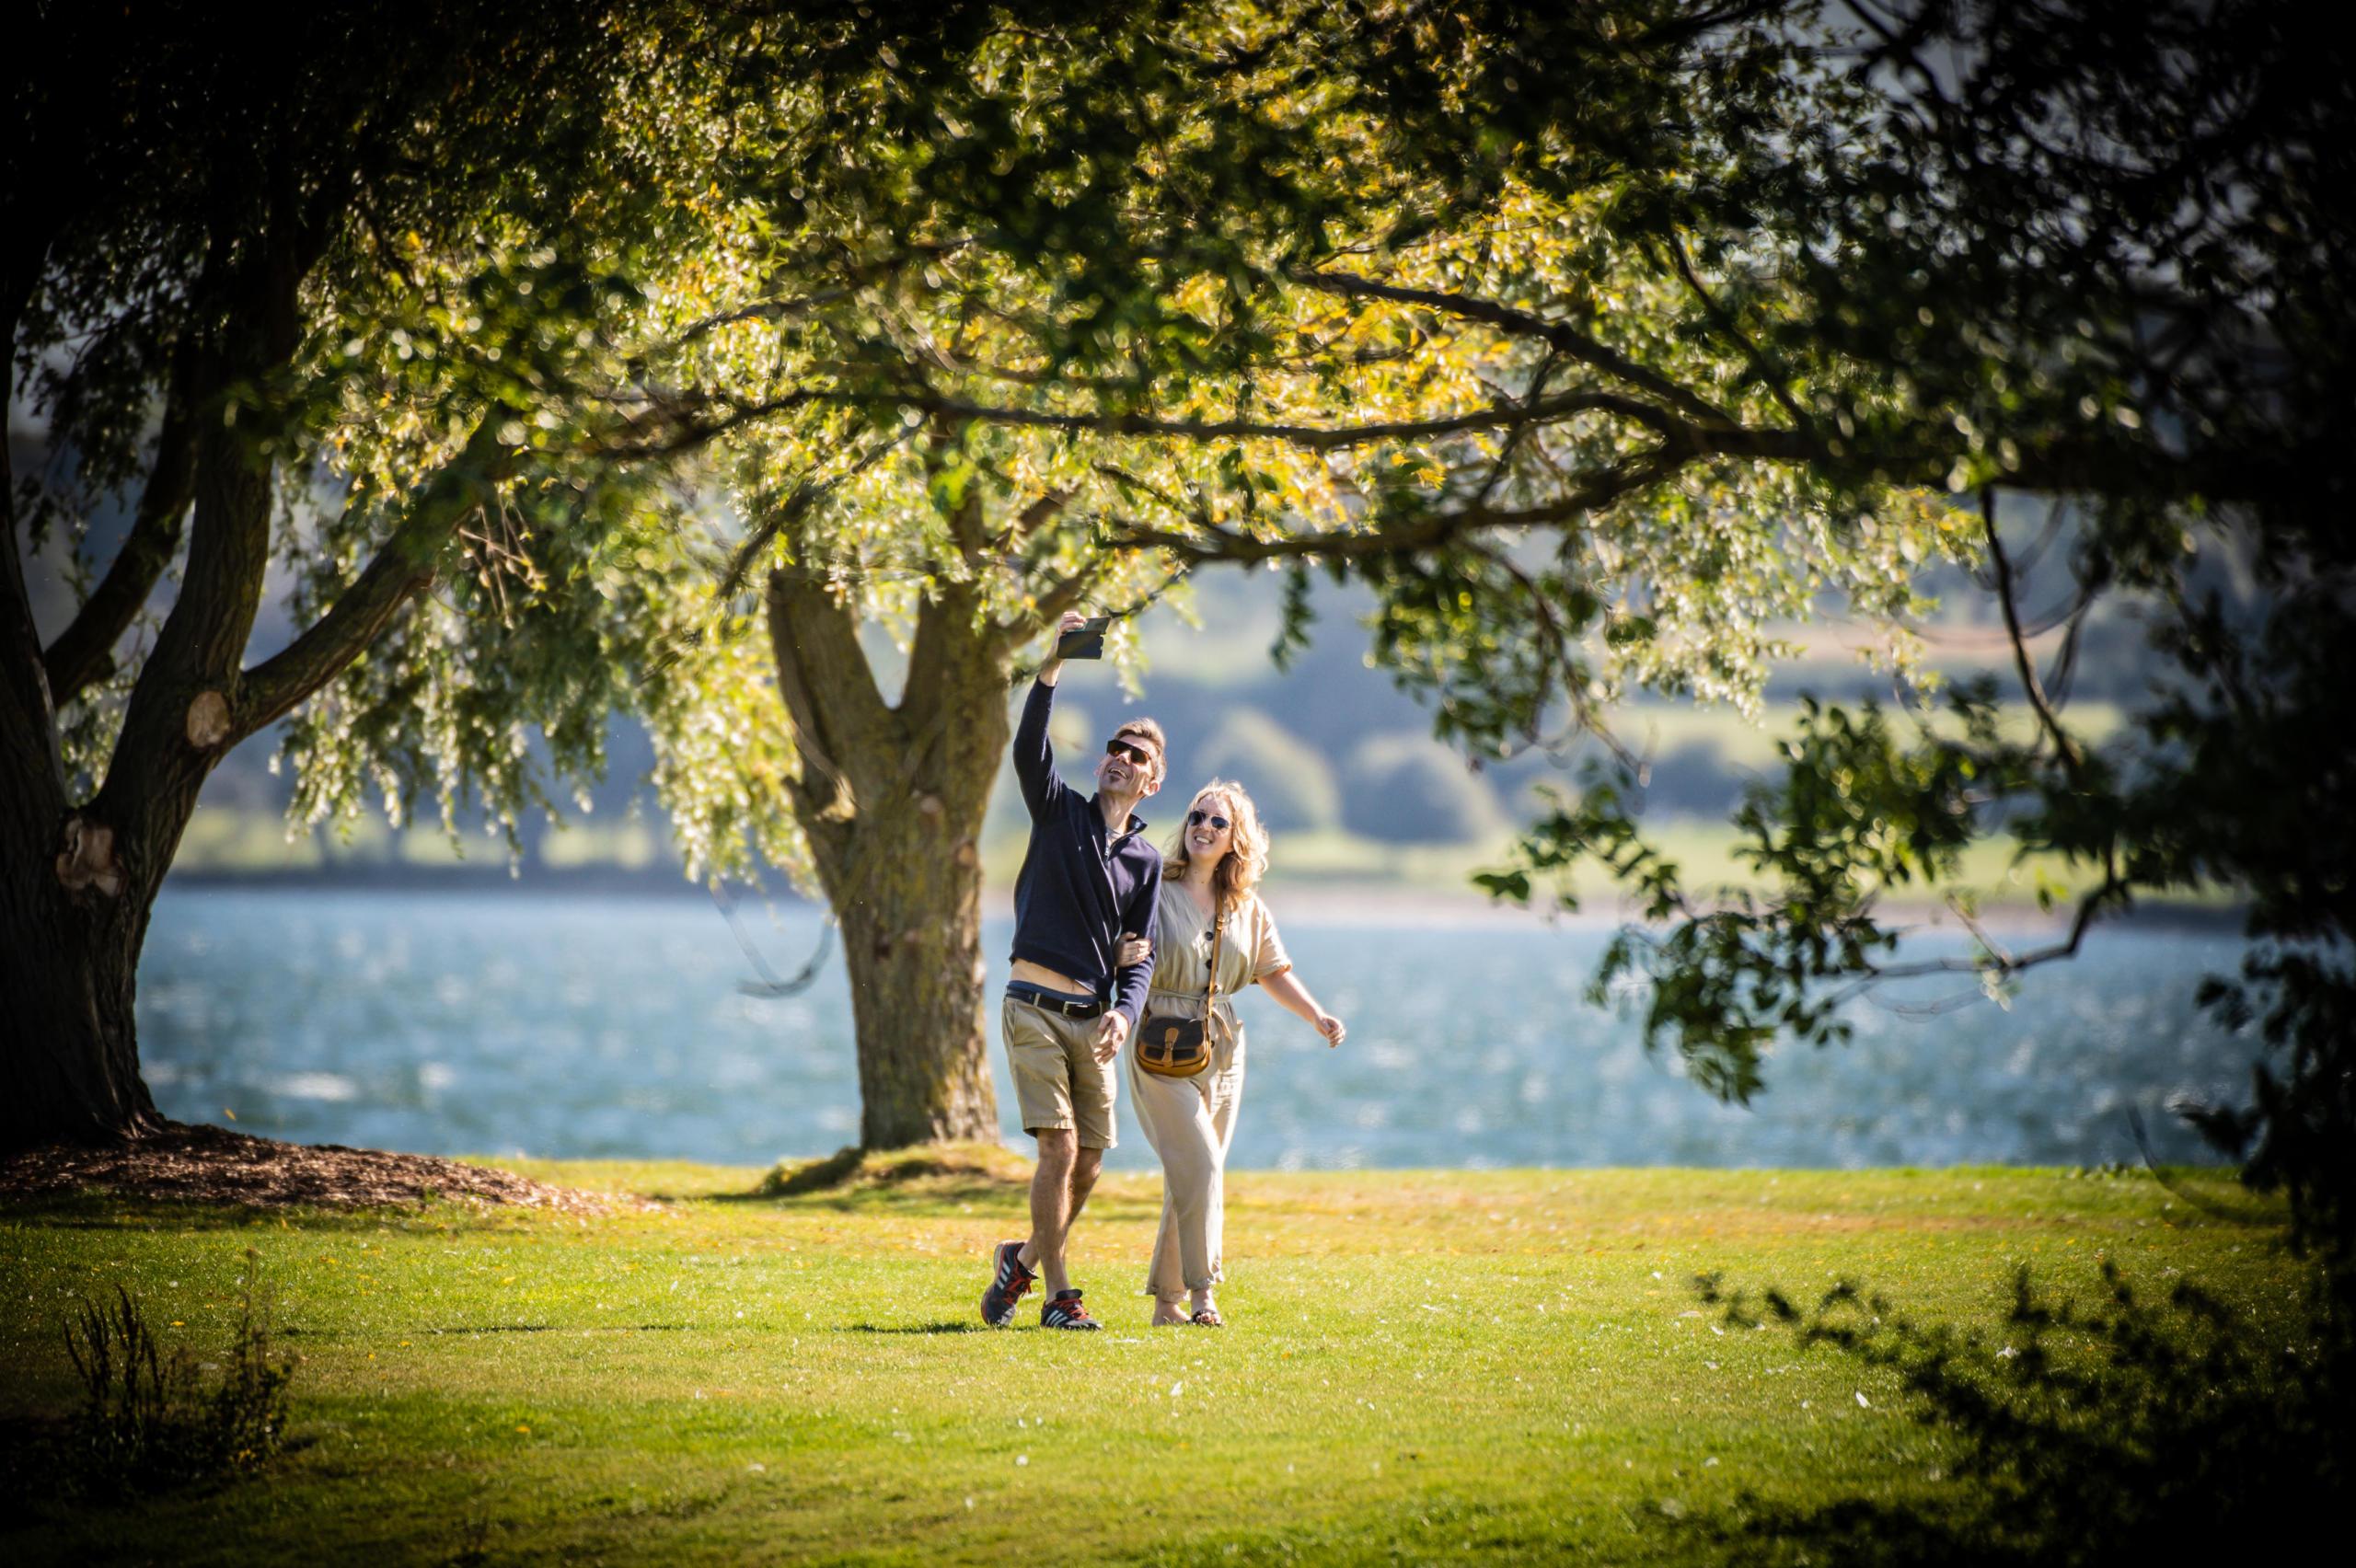 Rutland Water couple walking